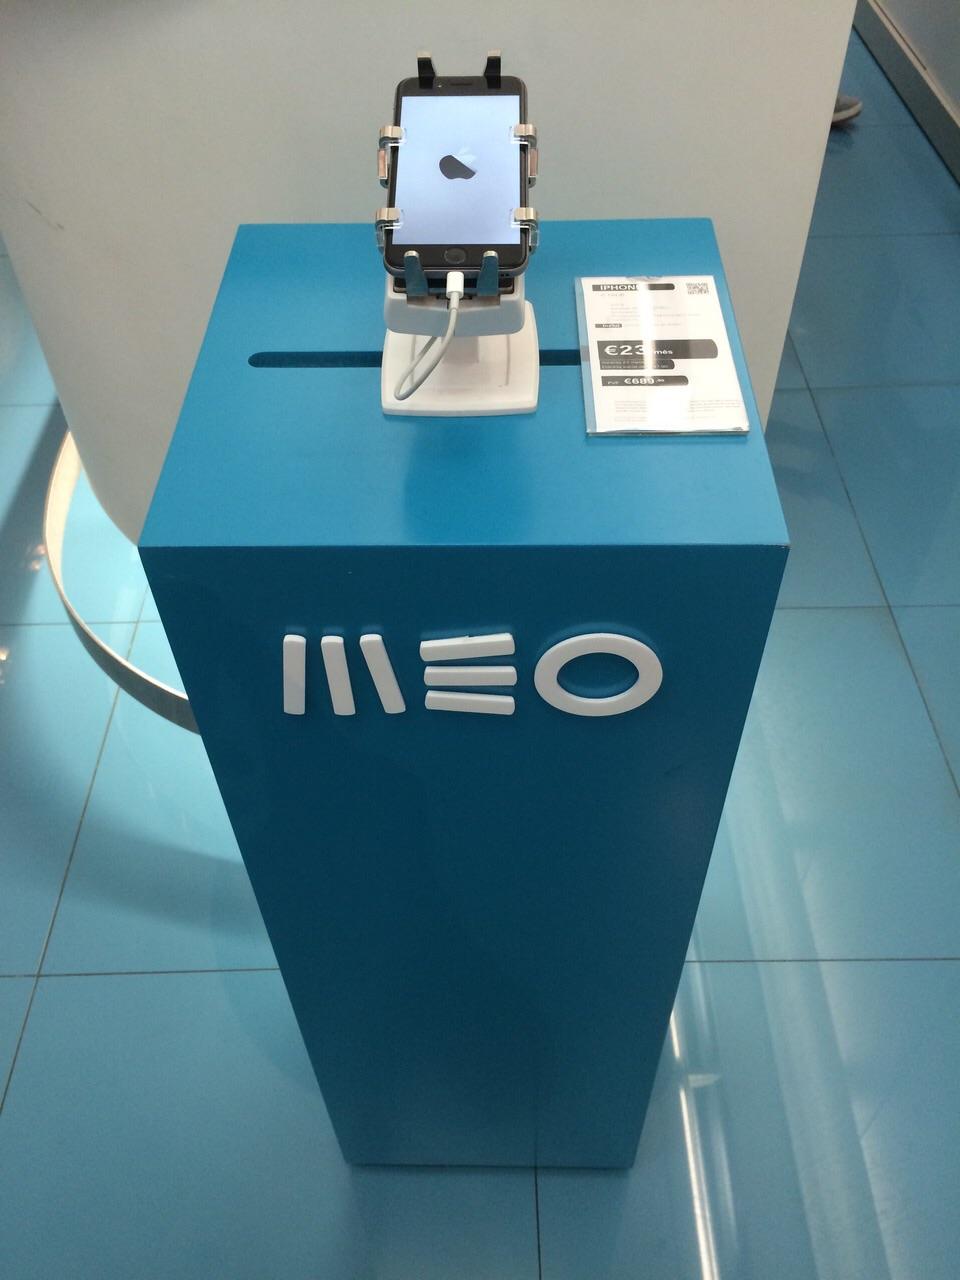 gripzo-iphone6-on-pedestal.jpeg